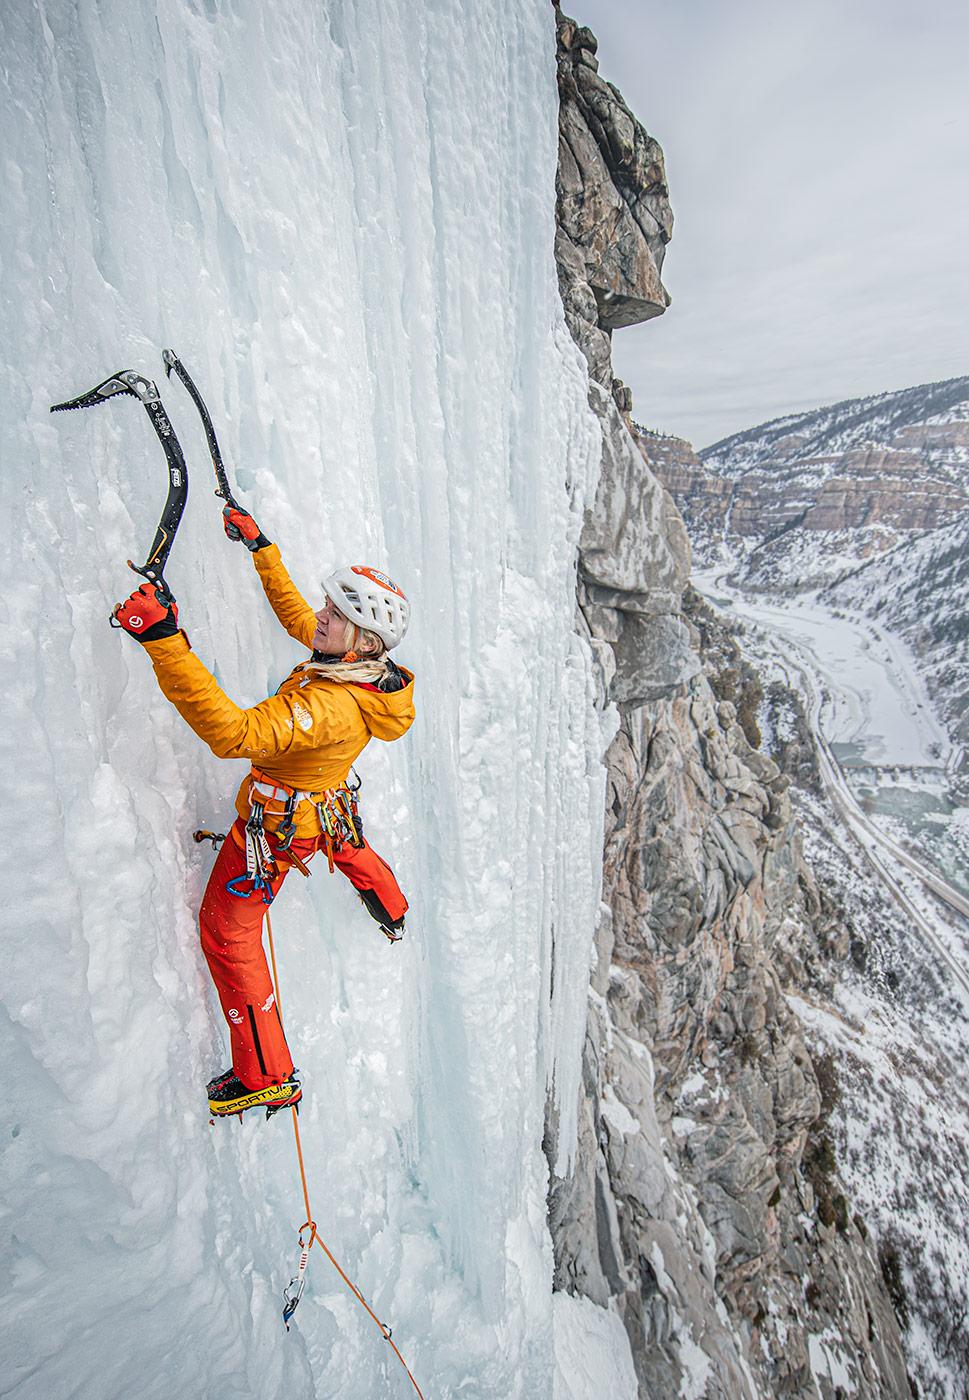 A woman ice climbs high above a Colorado landscape.